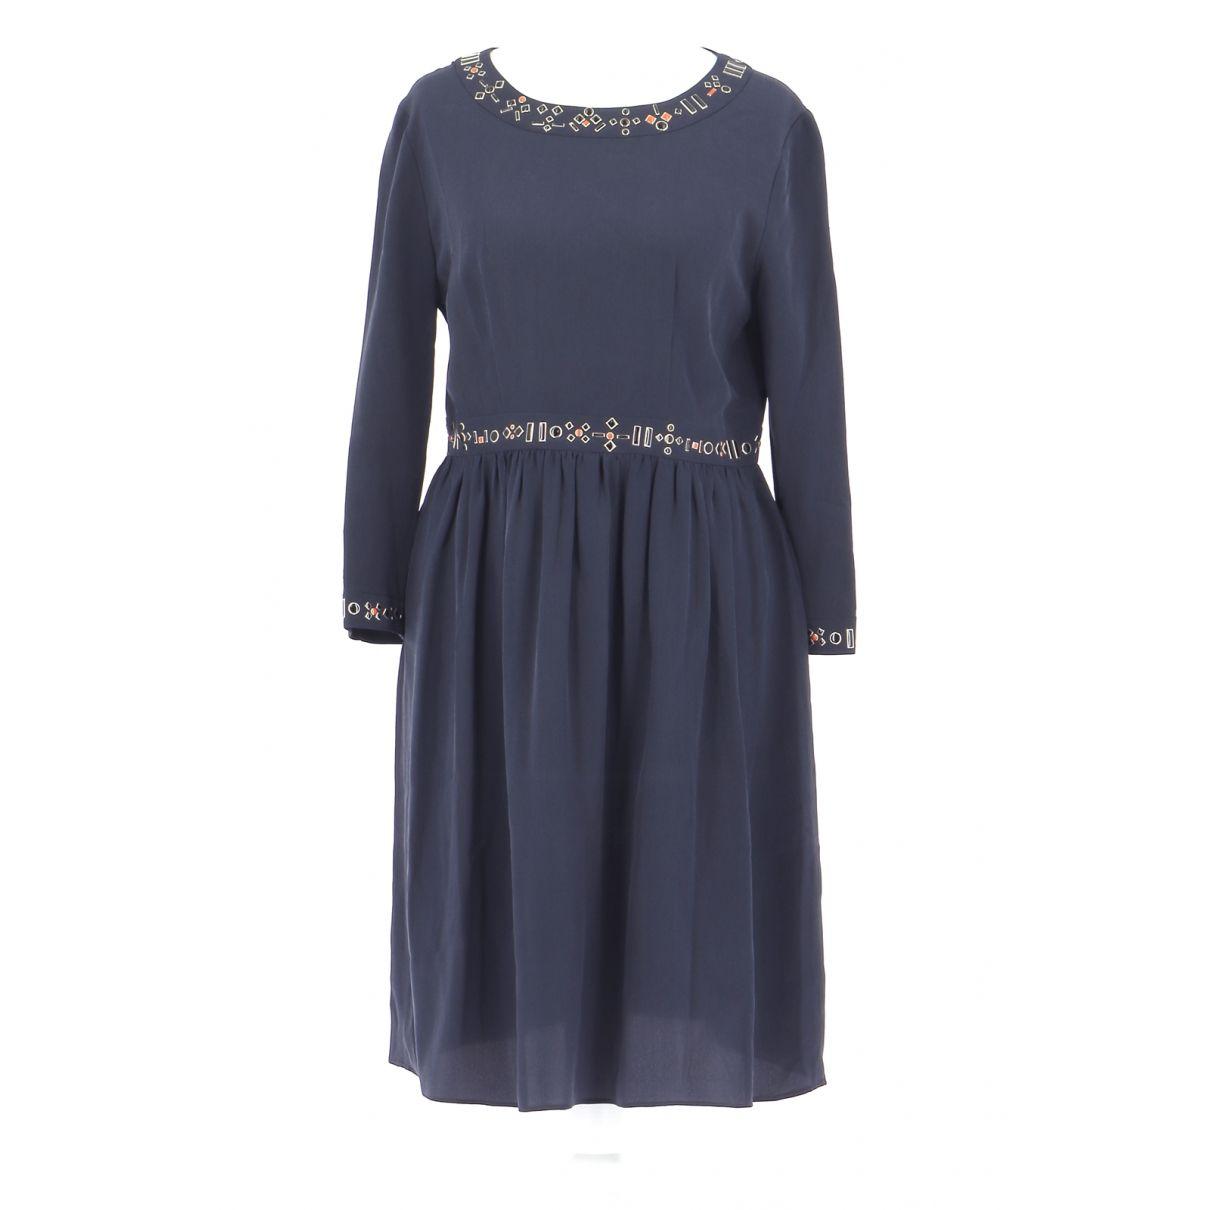 Robes Vanessa Bruno Athe pour femme en soie. Taille 36 FR.